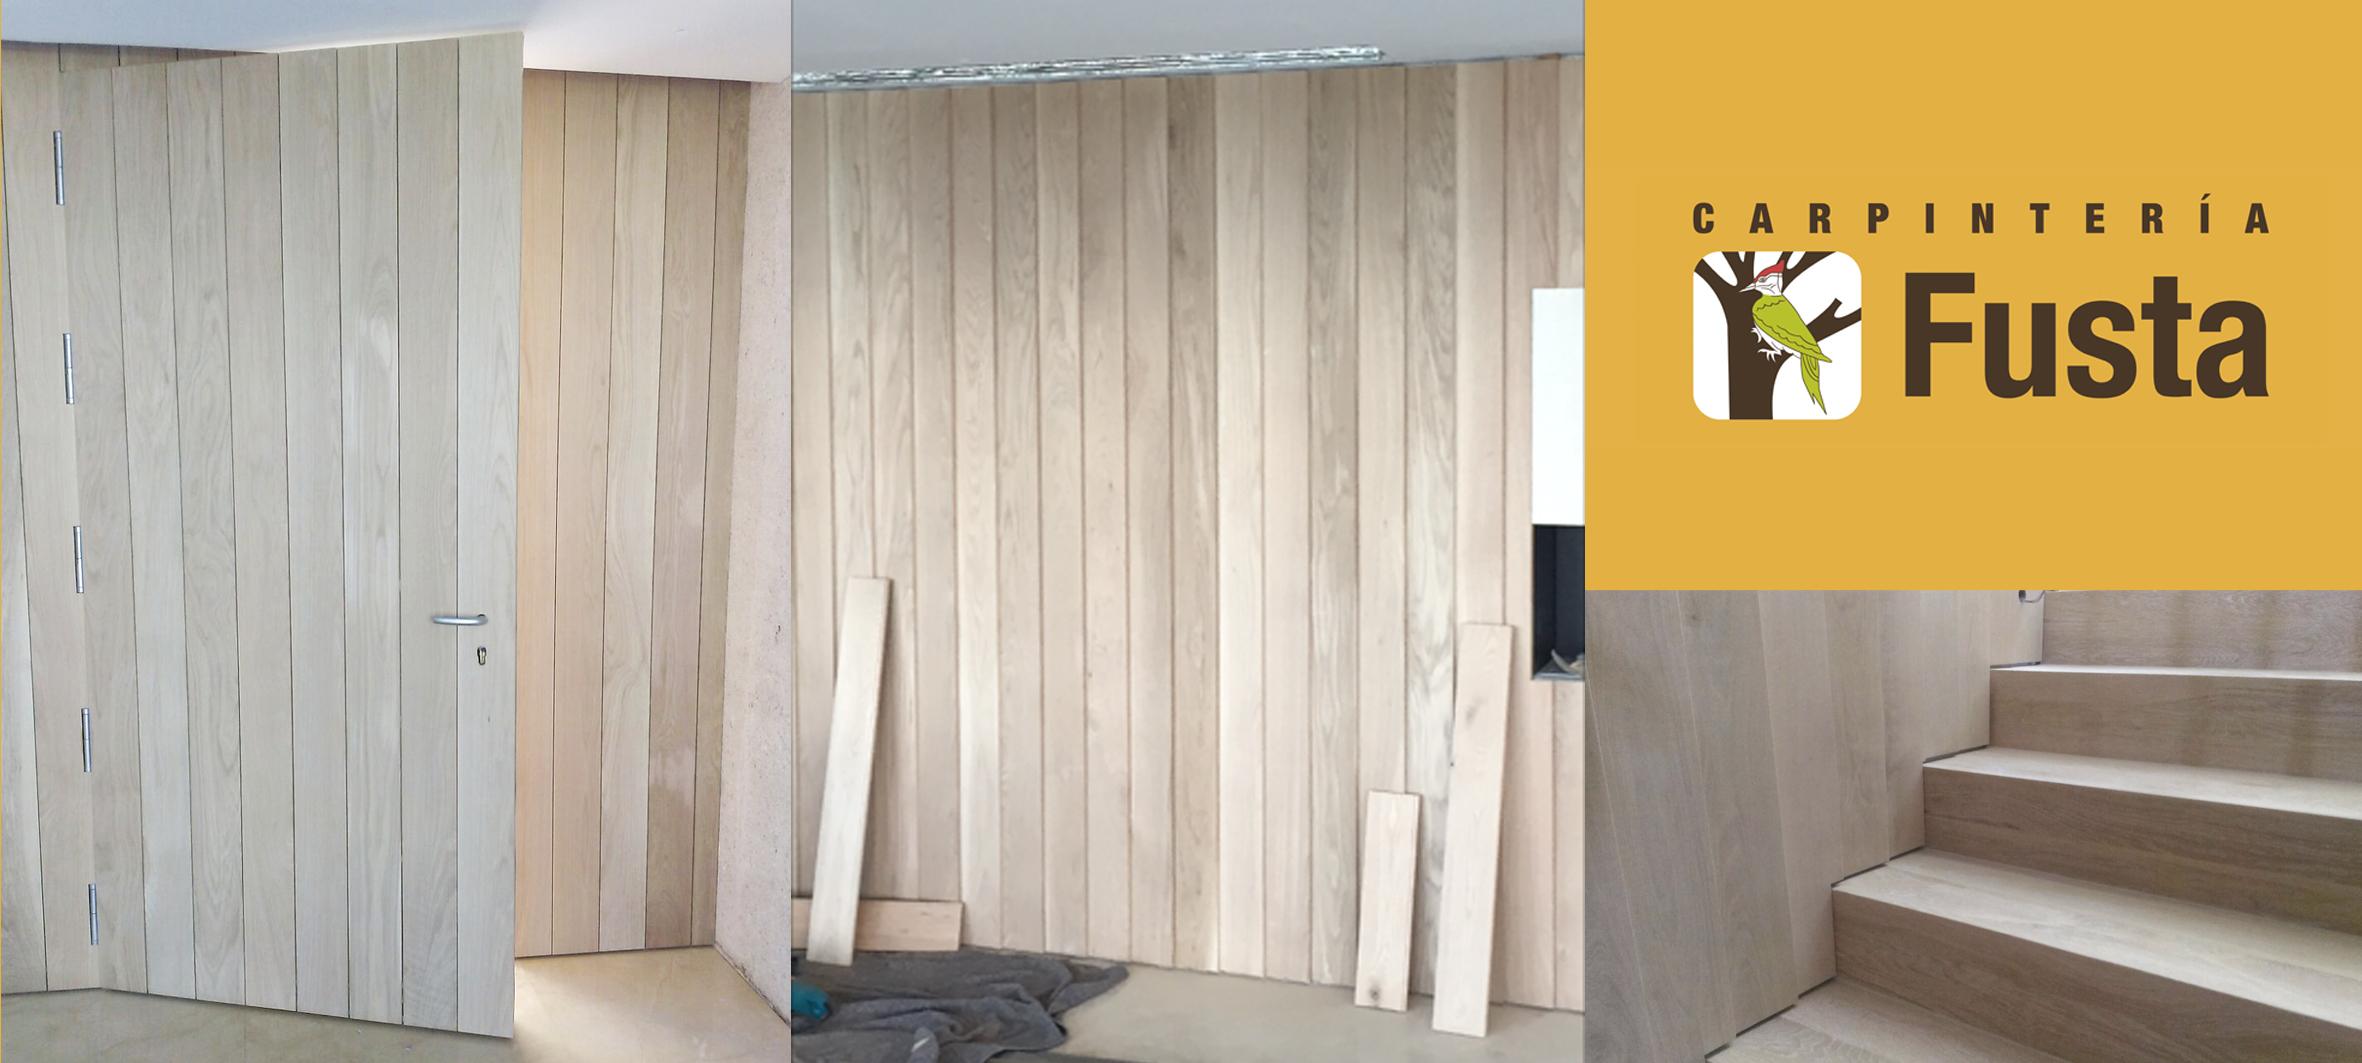 Revestimientos de paredes con paneles de madera - Paneles para revestir paredes ...